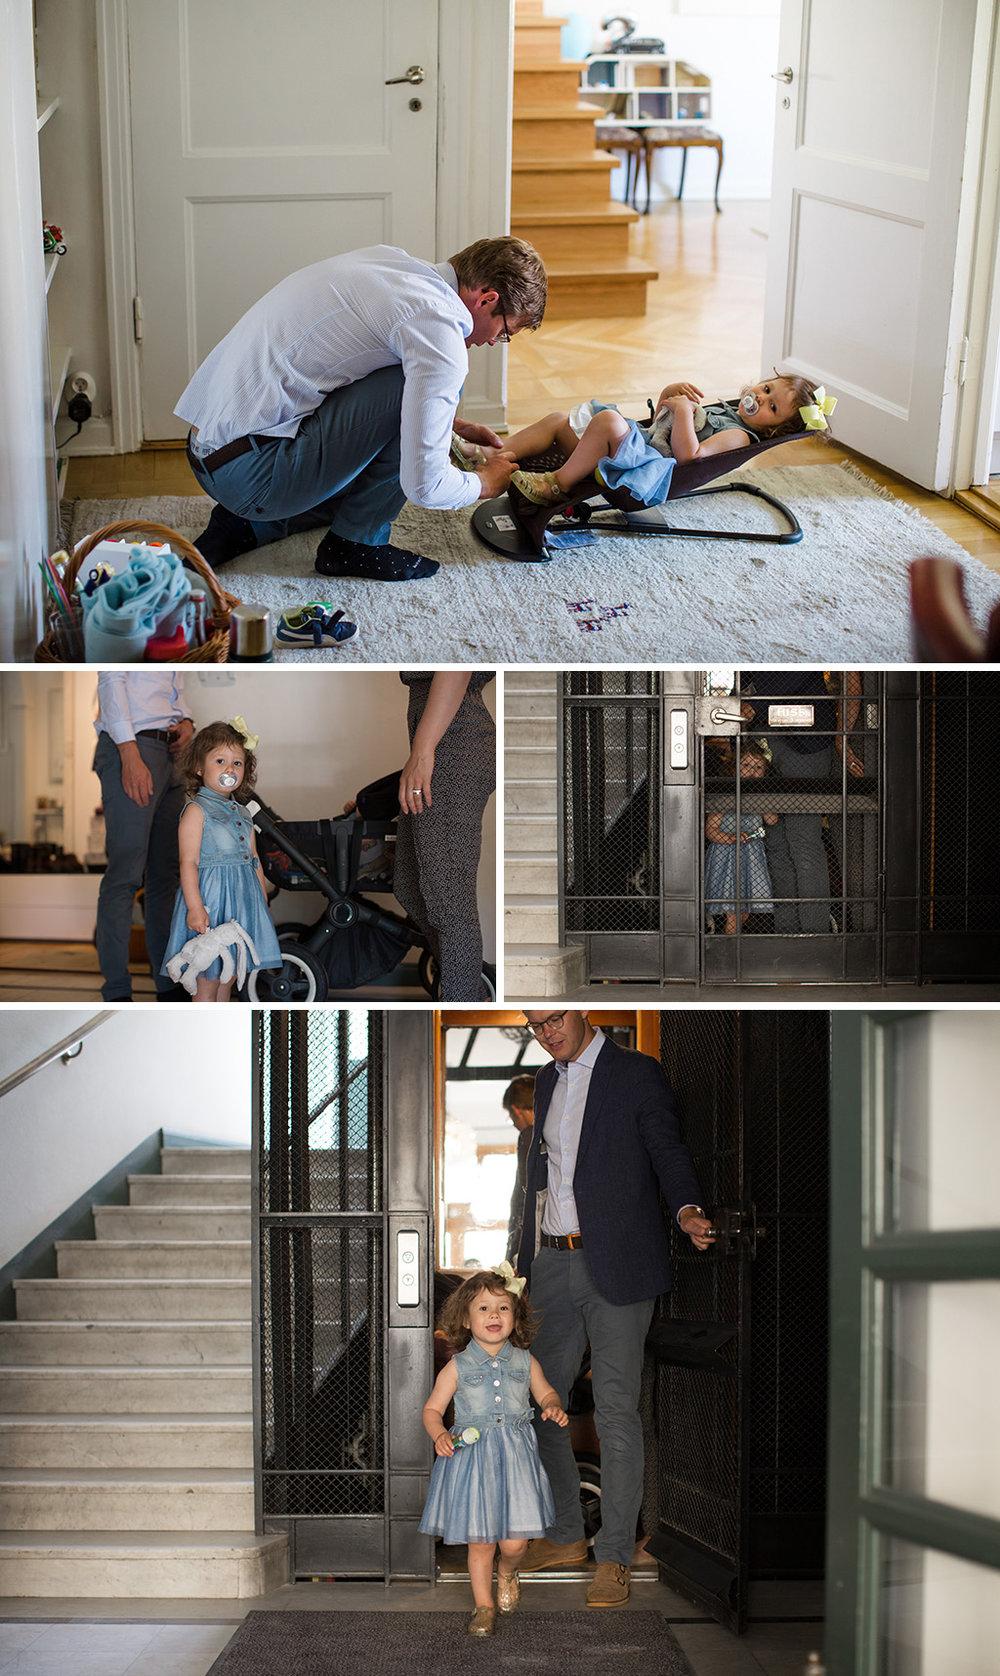 Lifestyle-hemma-hos-fotografering_familjefotograf-Stockholm-6.jpg